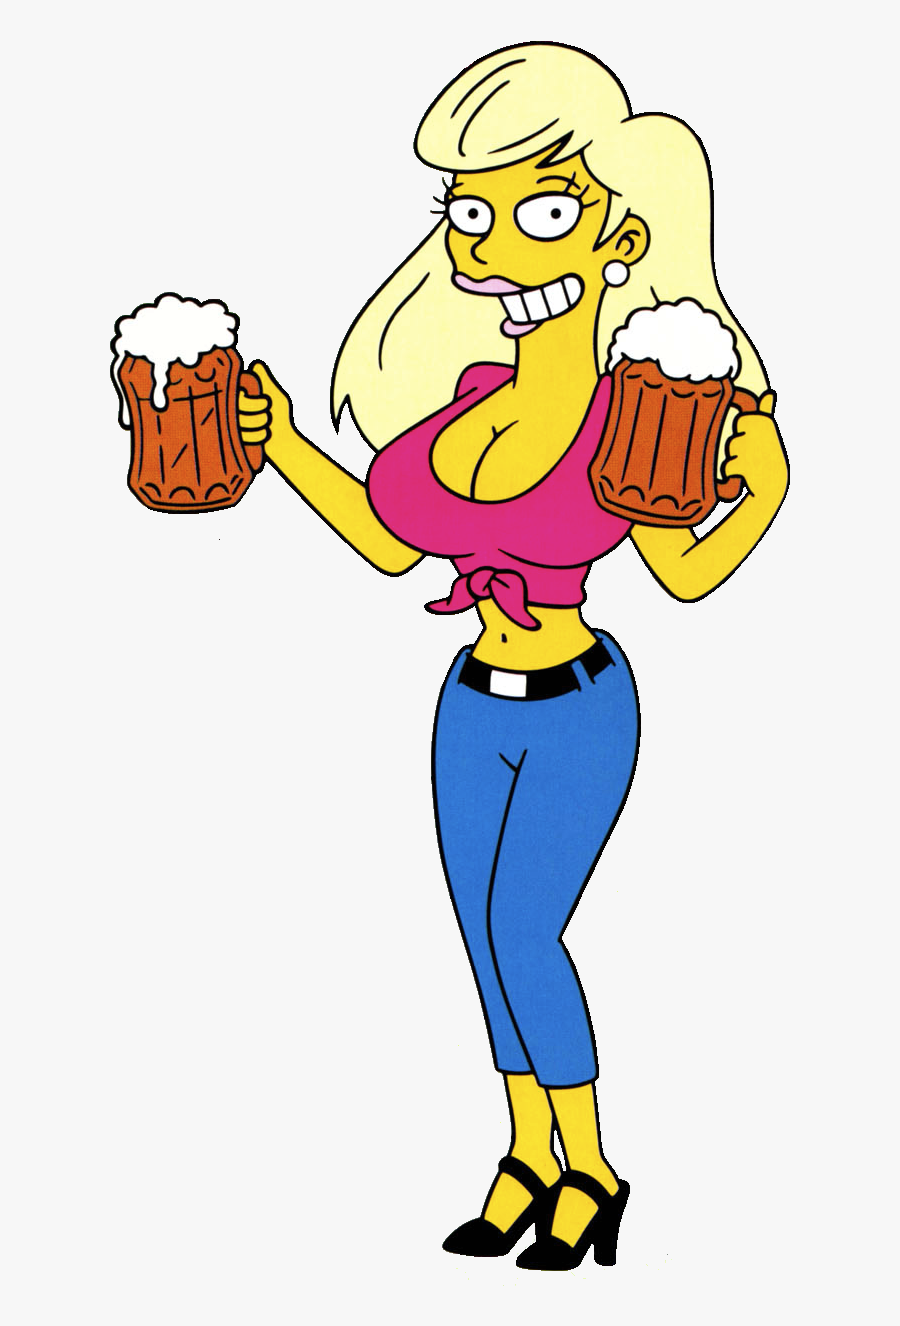 #boobies #sexy #woman #trentino #beer #drunk #hot #hottie - Titania Simpsons, Transparent Clipart